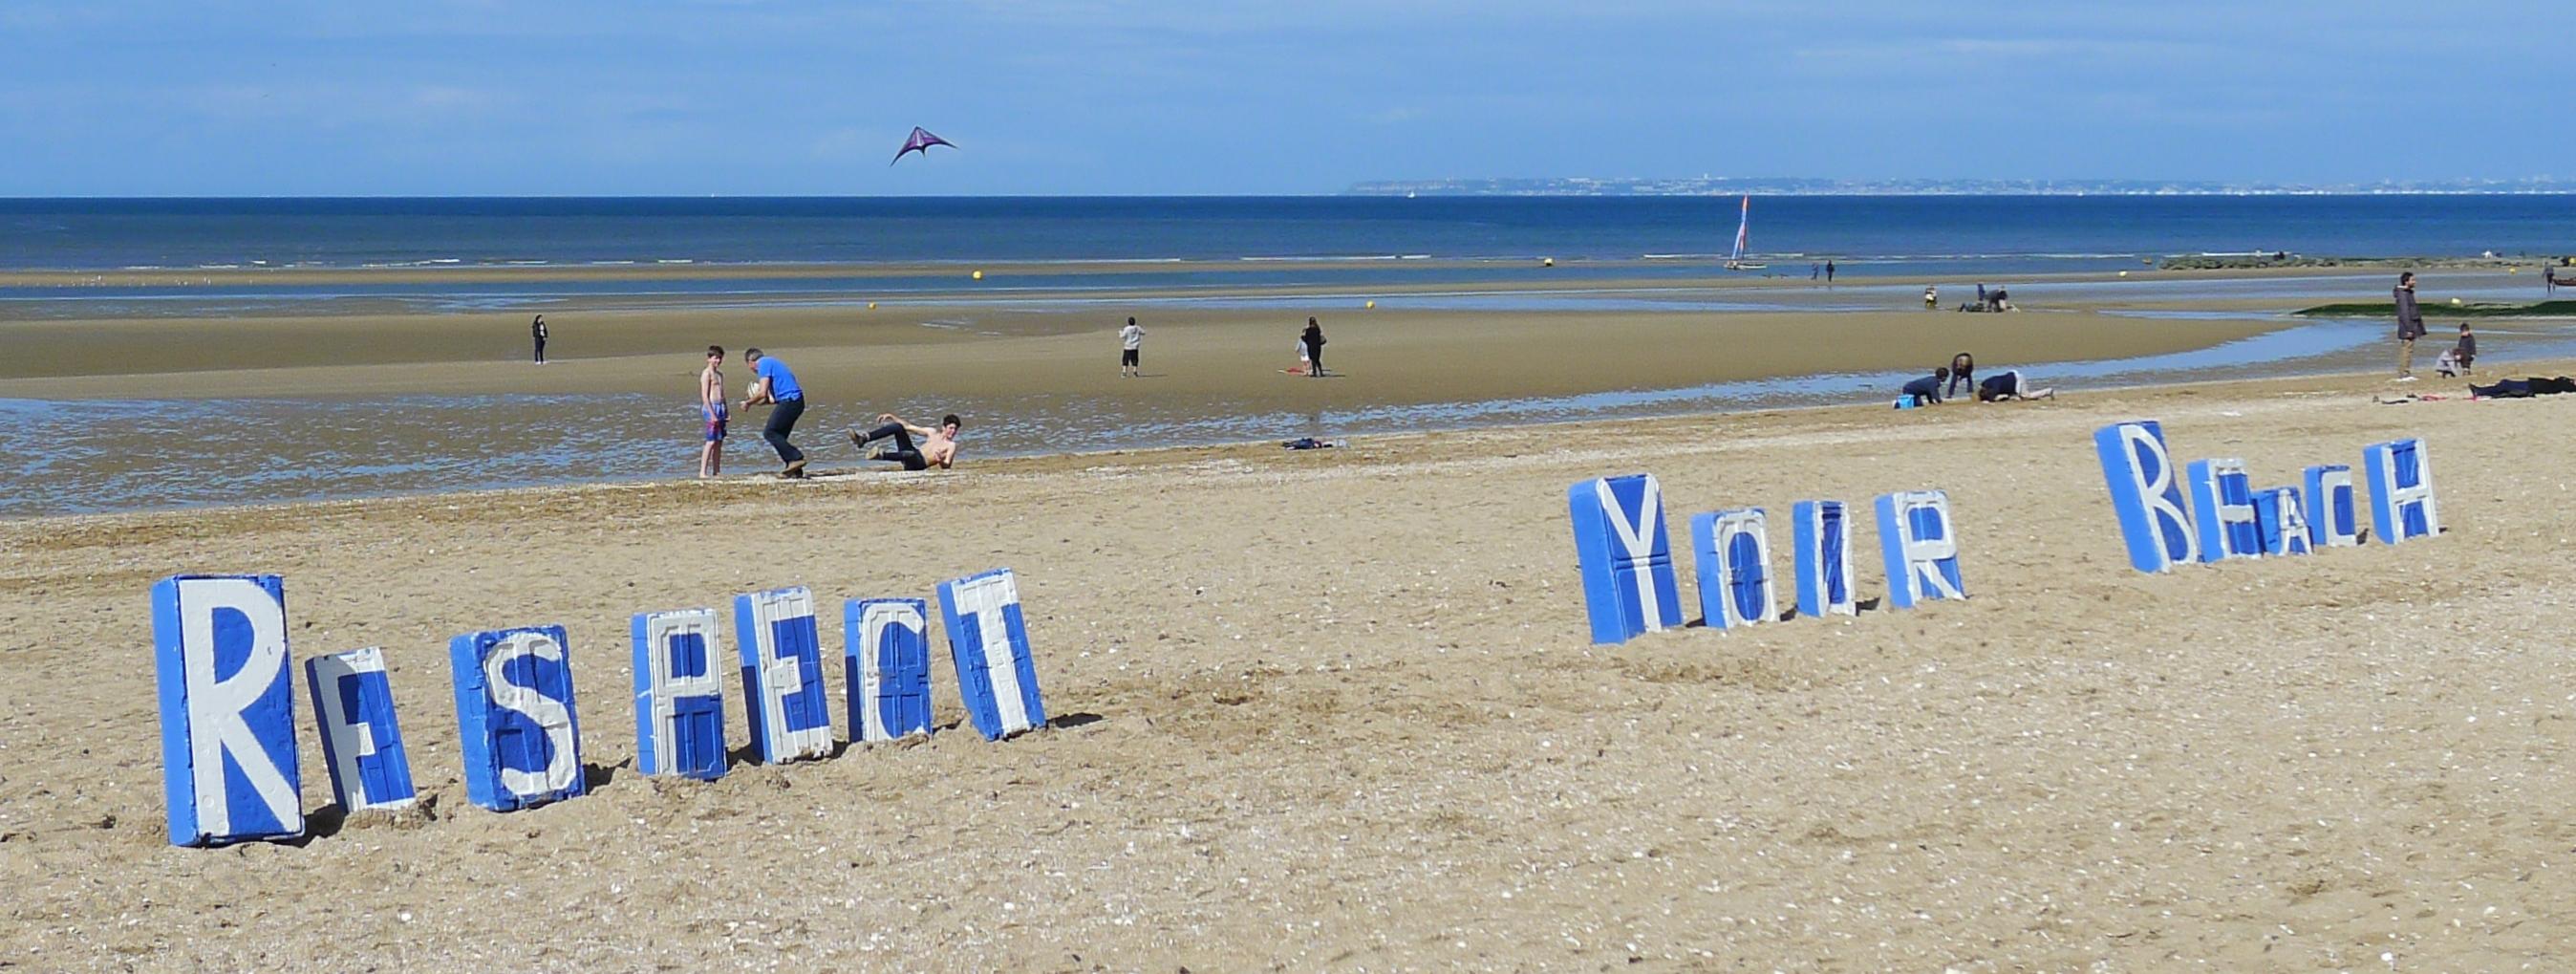 Respect Your Beach